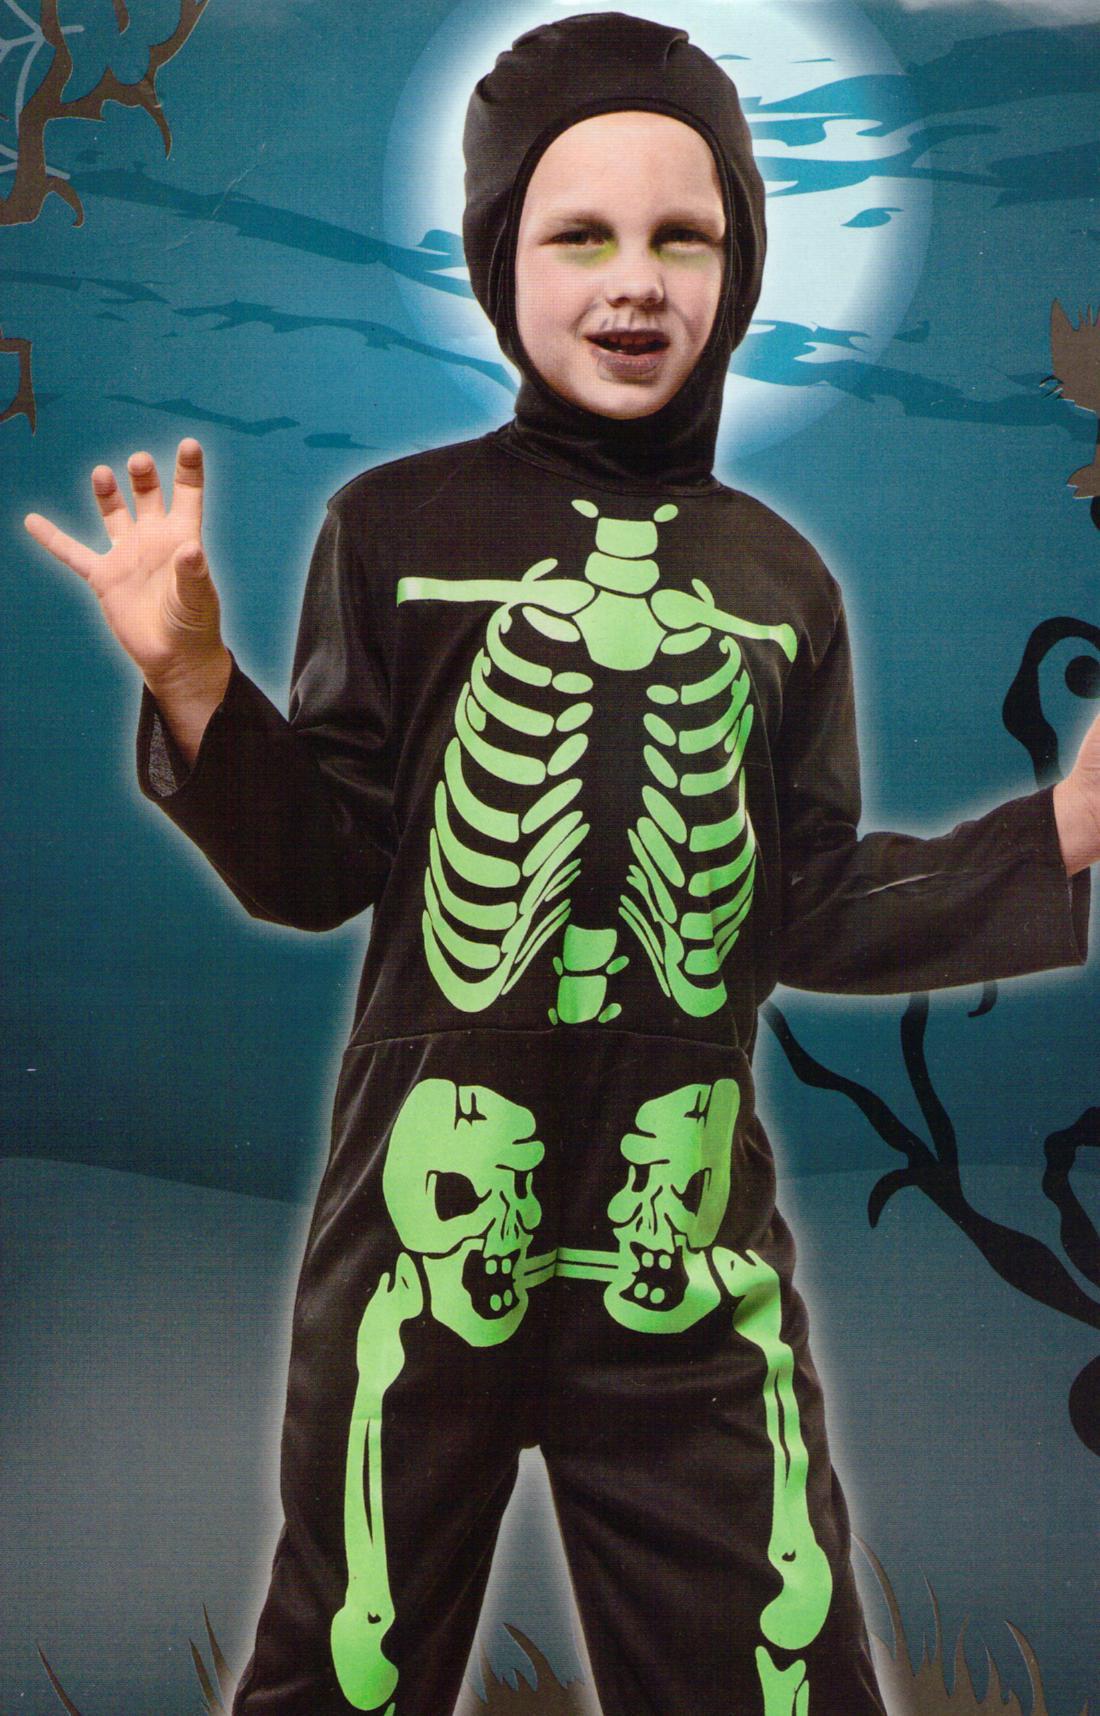 kinder kost m skelett knochenmann grusel halloween horror fasching karneval gr m ebay. Black Bedroom Furniture Sets. Home Design Ideas